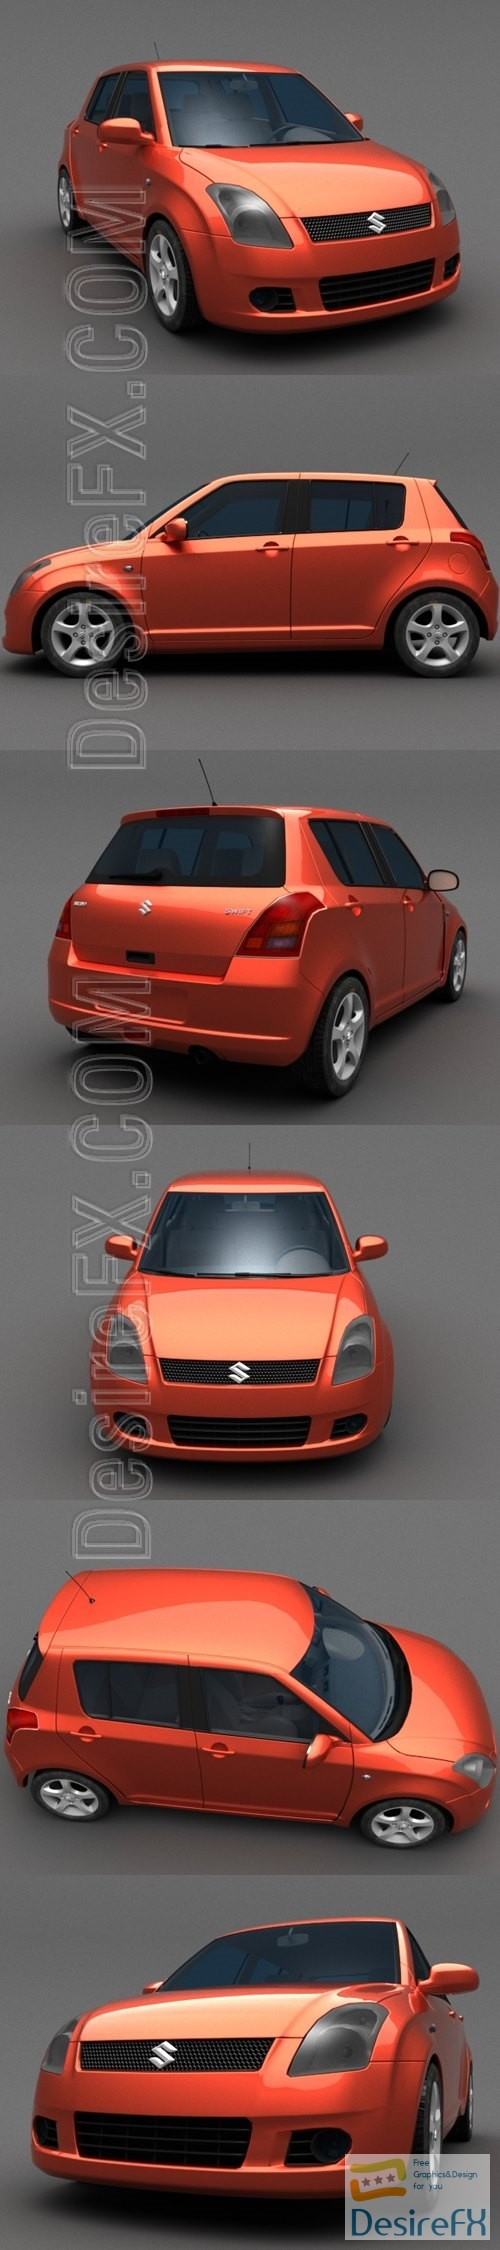 Suzuki Swift 3D model